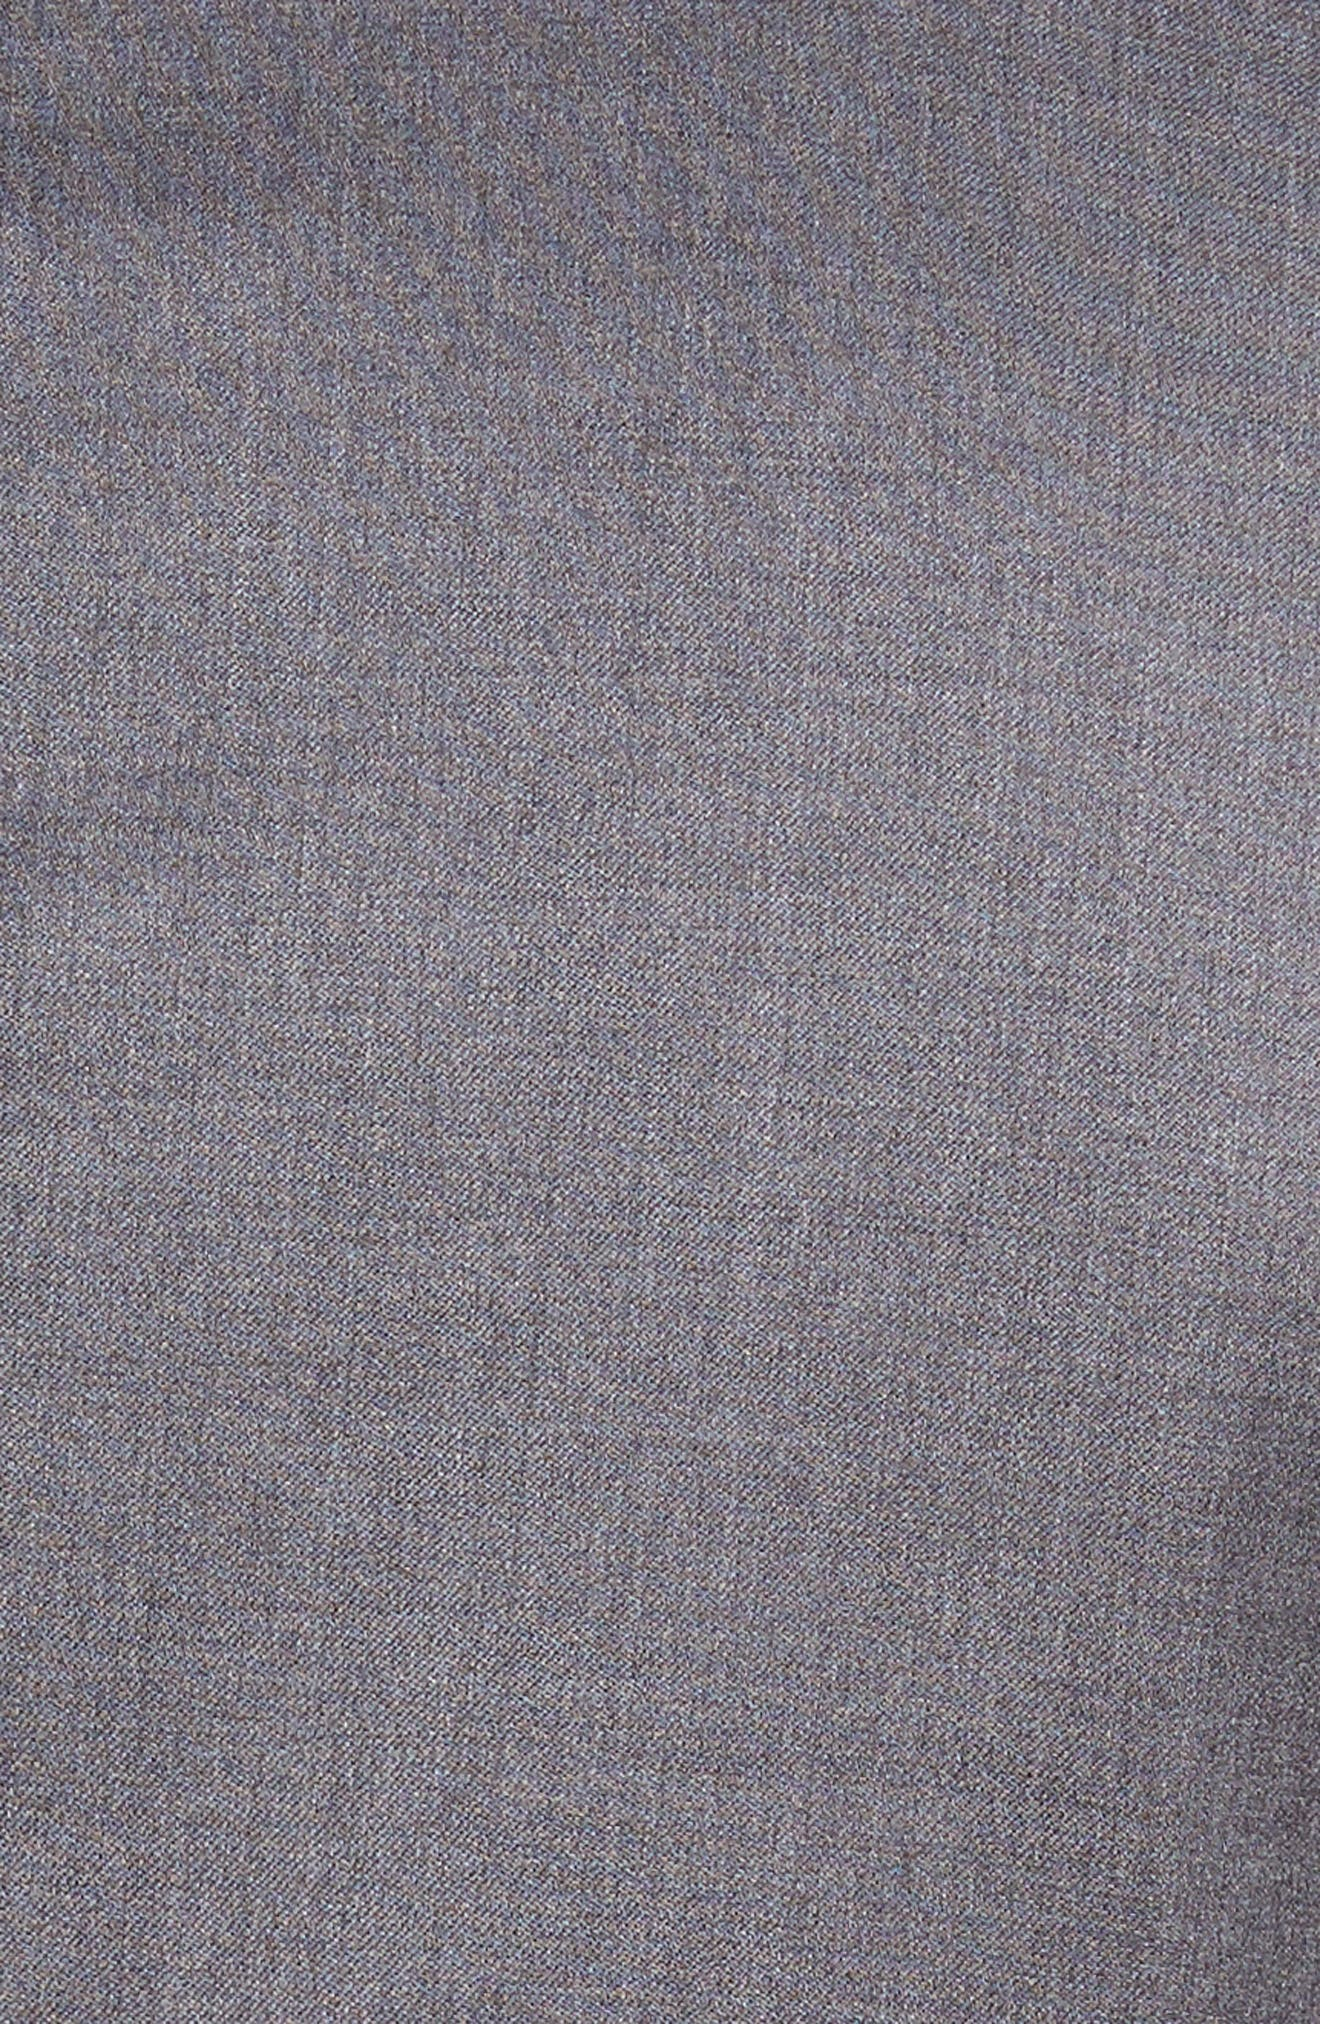 Ryan/Win Trim Fit Solid Wool Suit,                             Alternate thumbnail 7, color,                             031